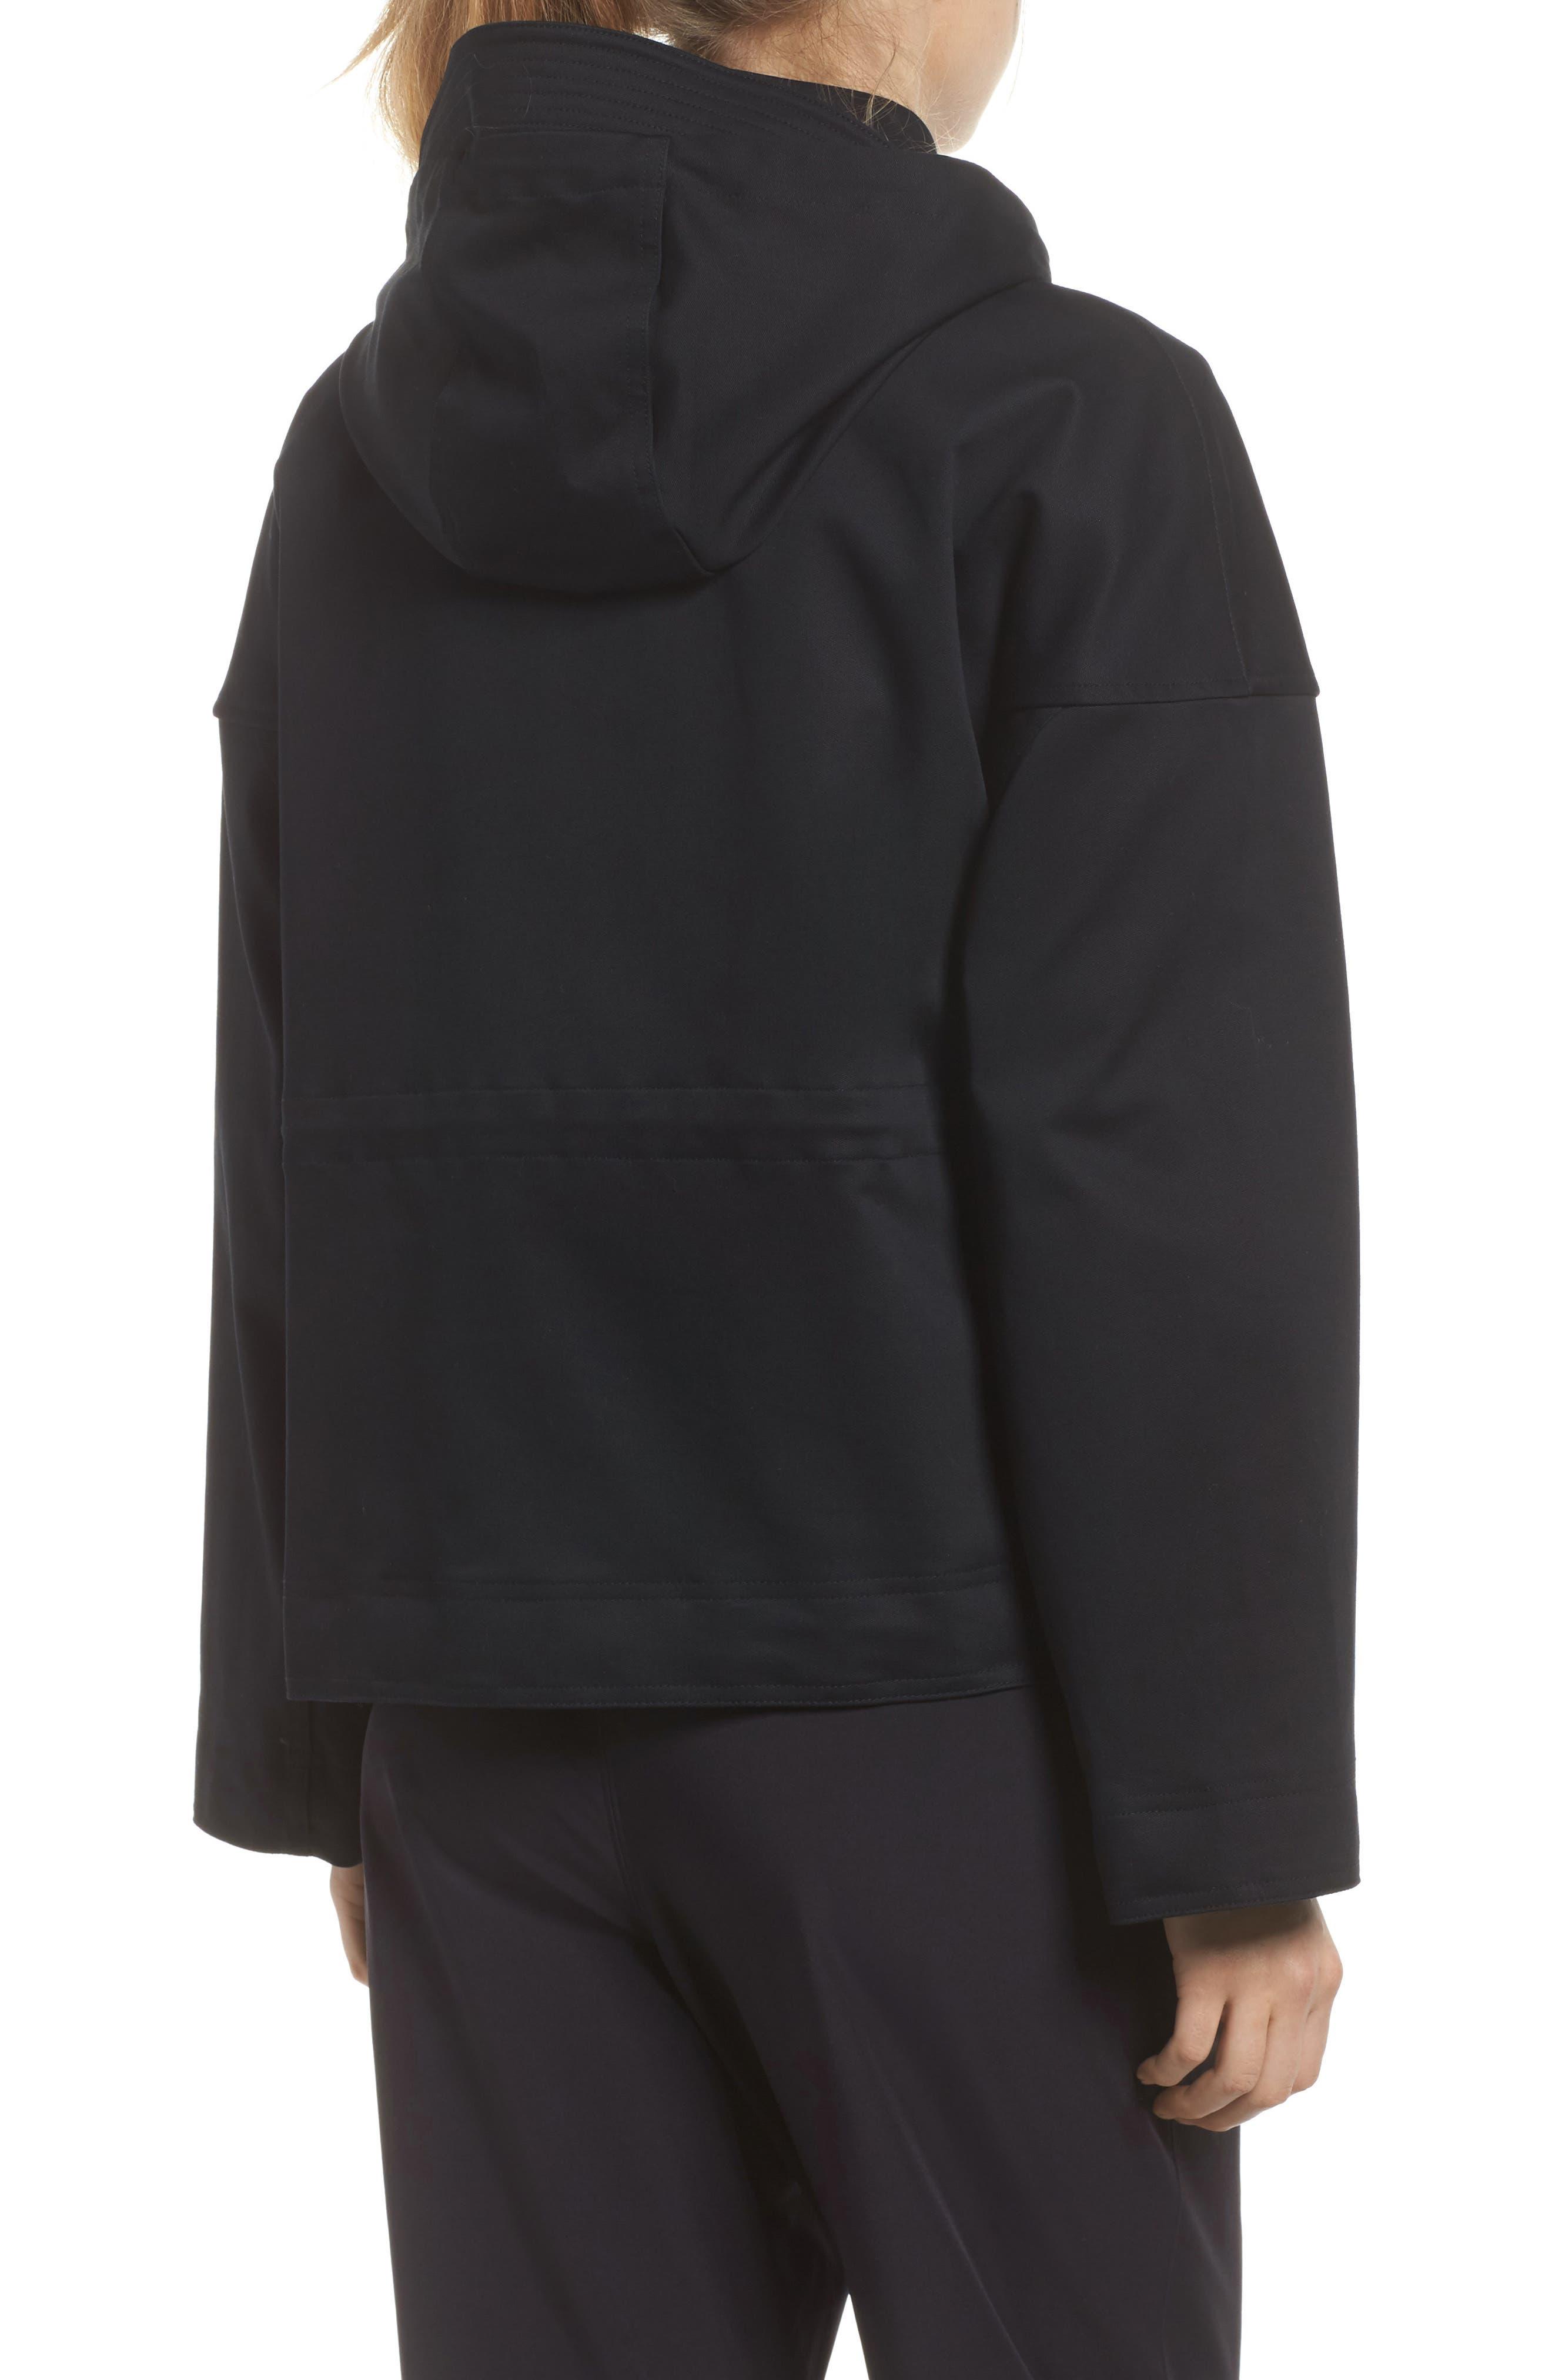 NikeLab Collection Women's Tactical Jacket,                             Alternate thumbnail 2, color,                             Black/ Black